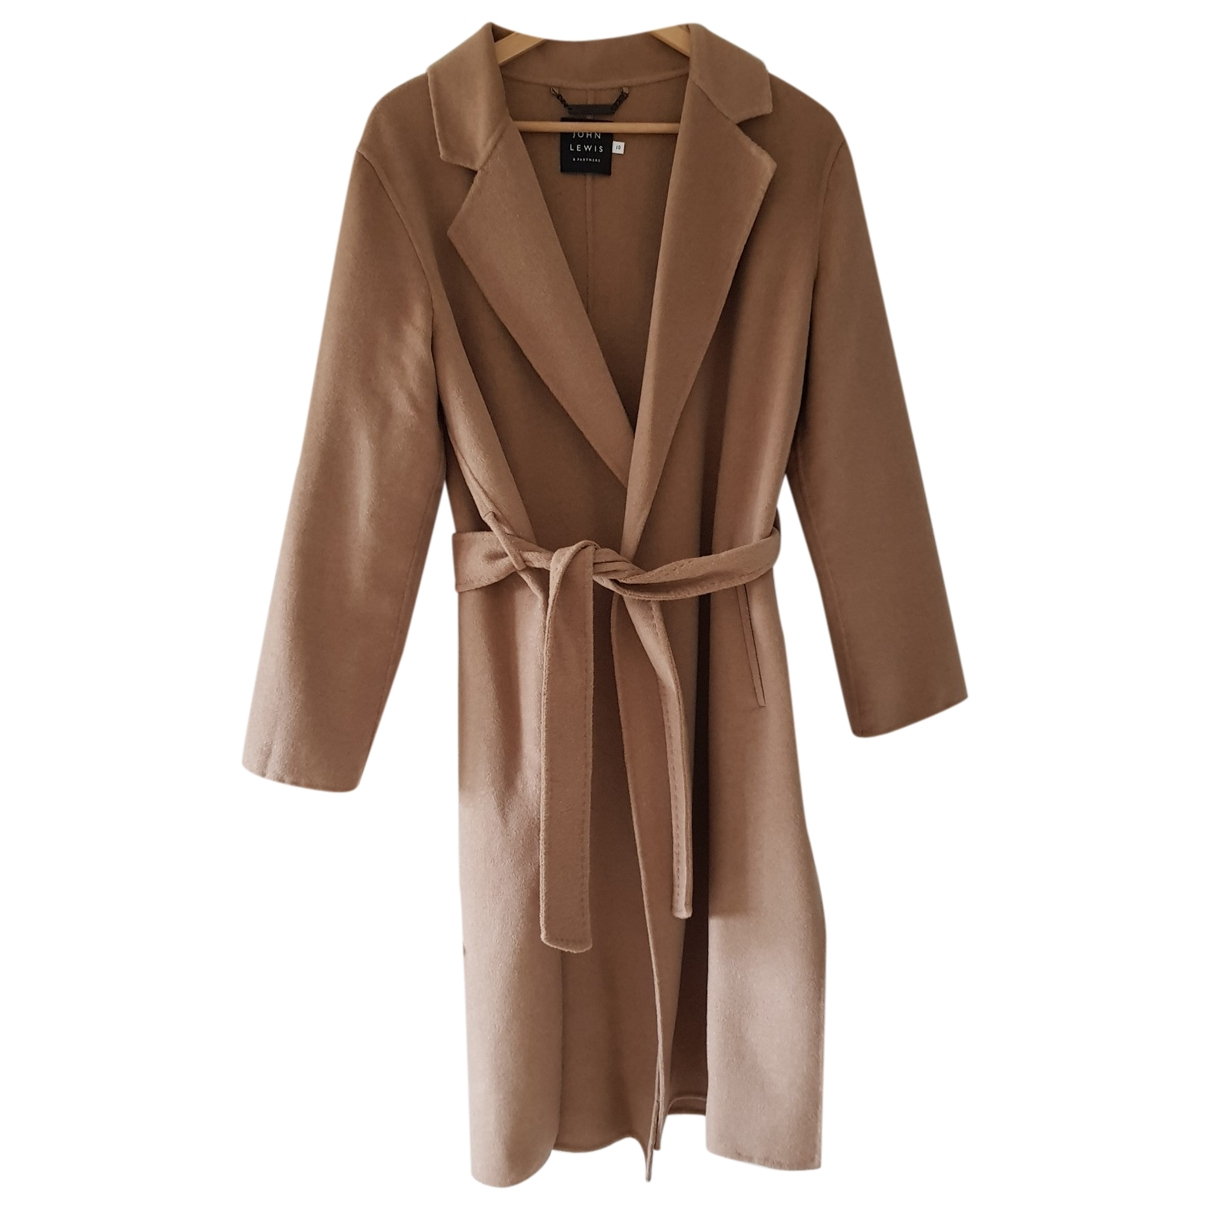 John Lewis \N Camel coat for Women 10 UK